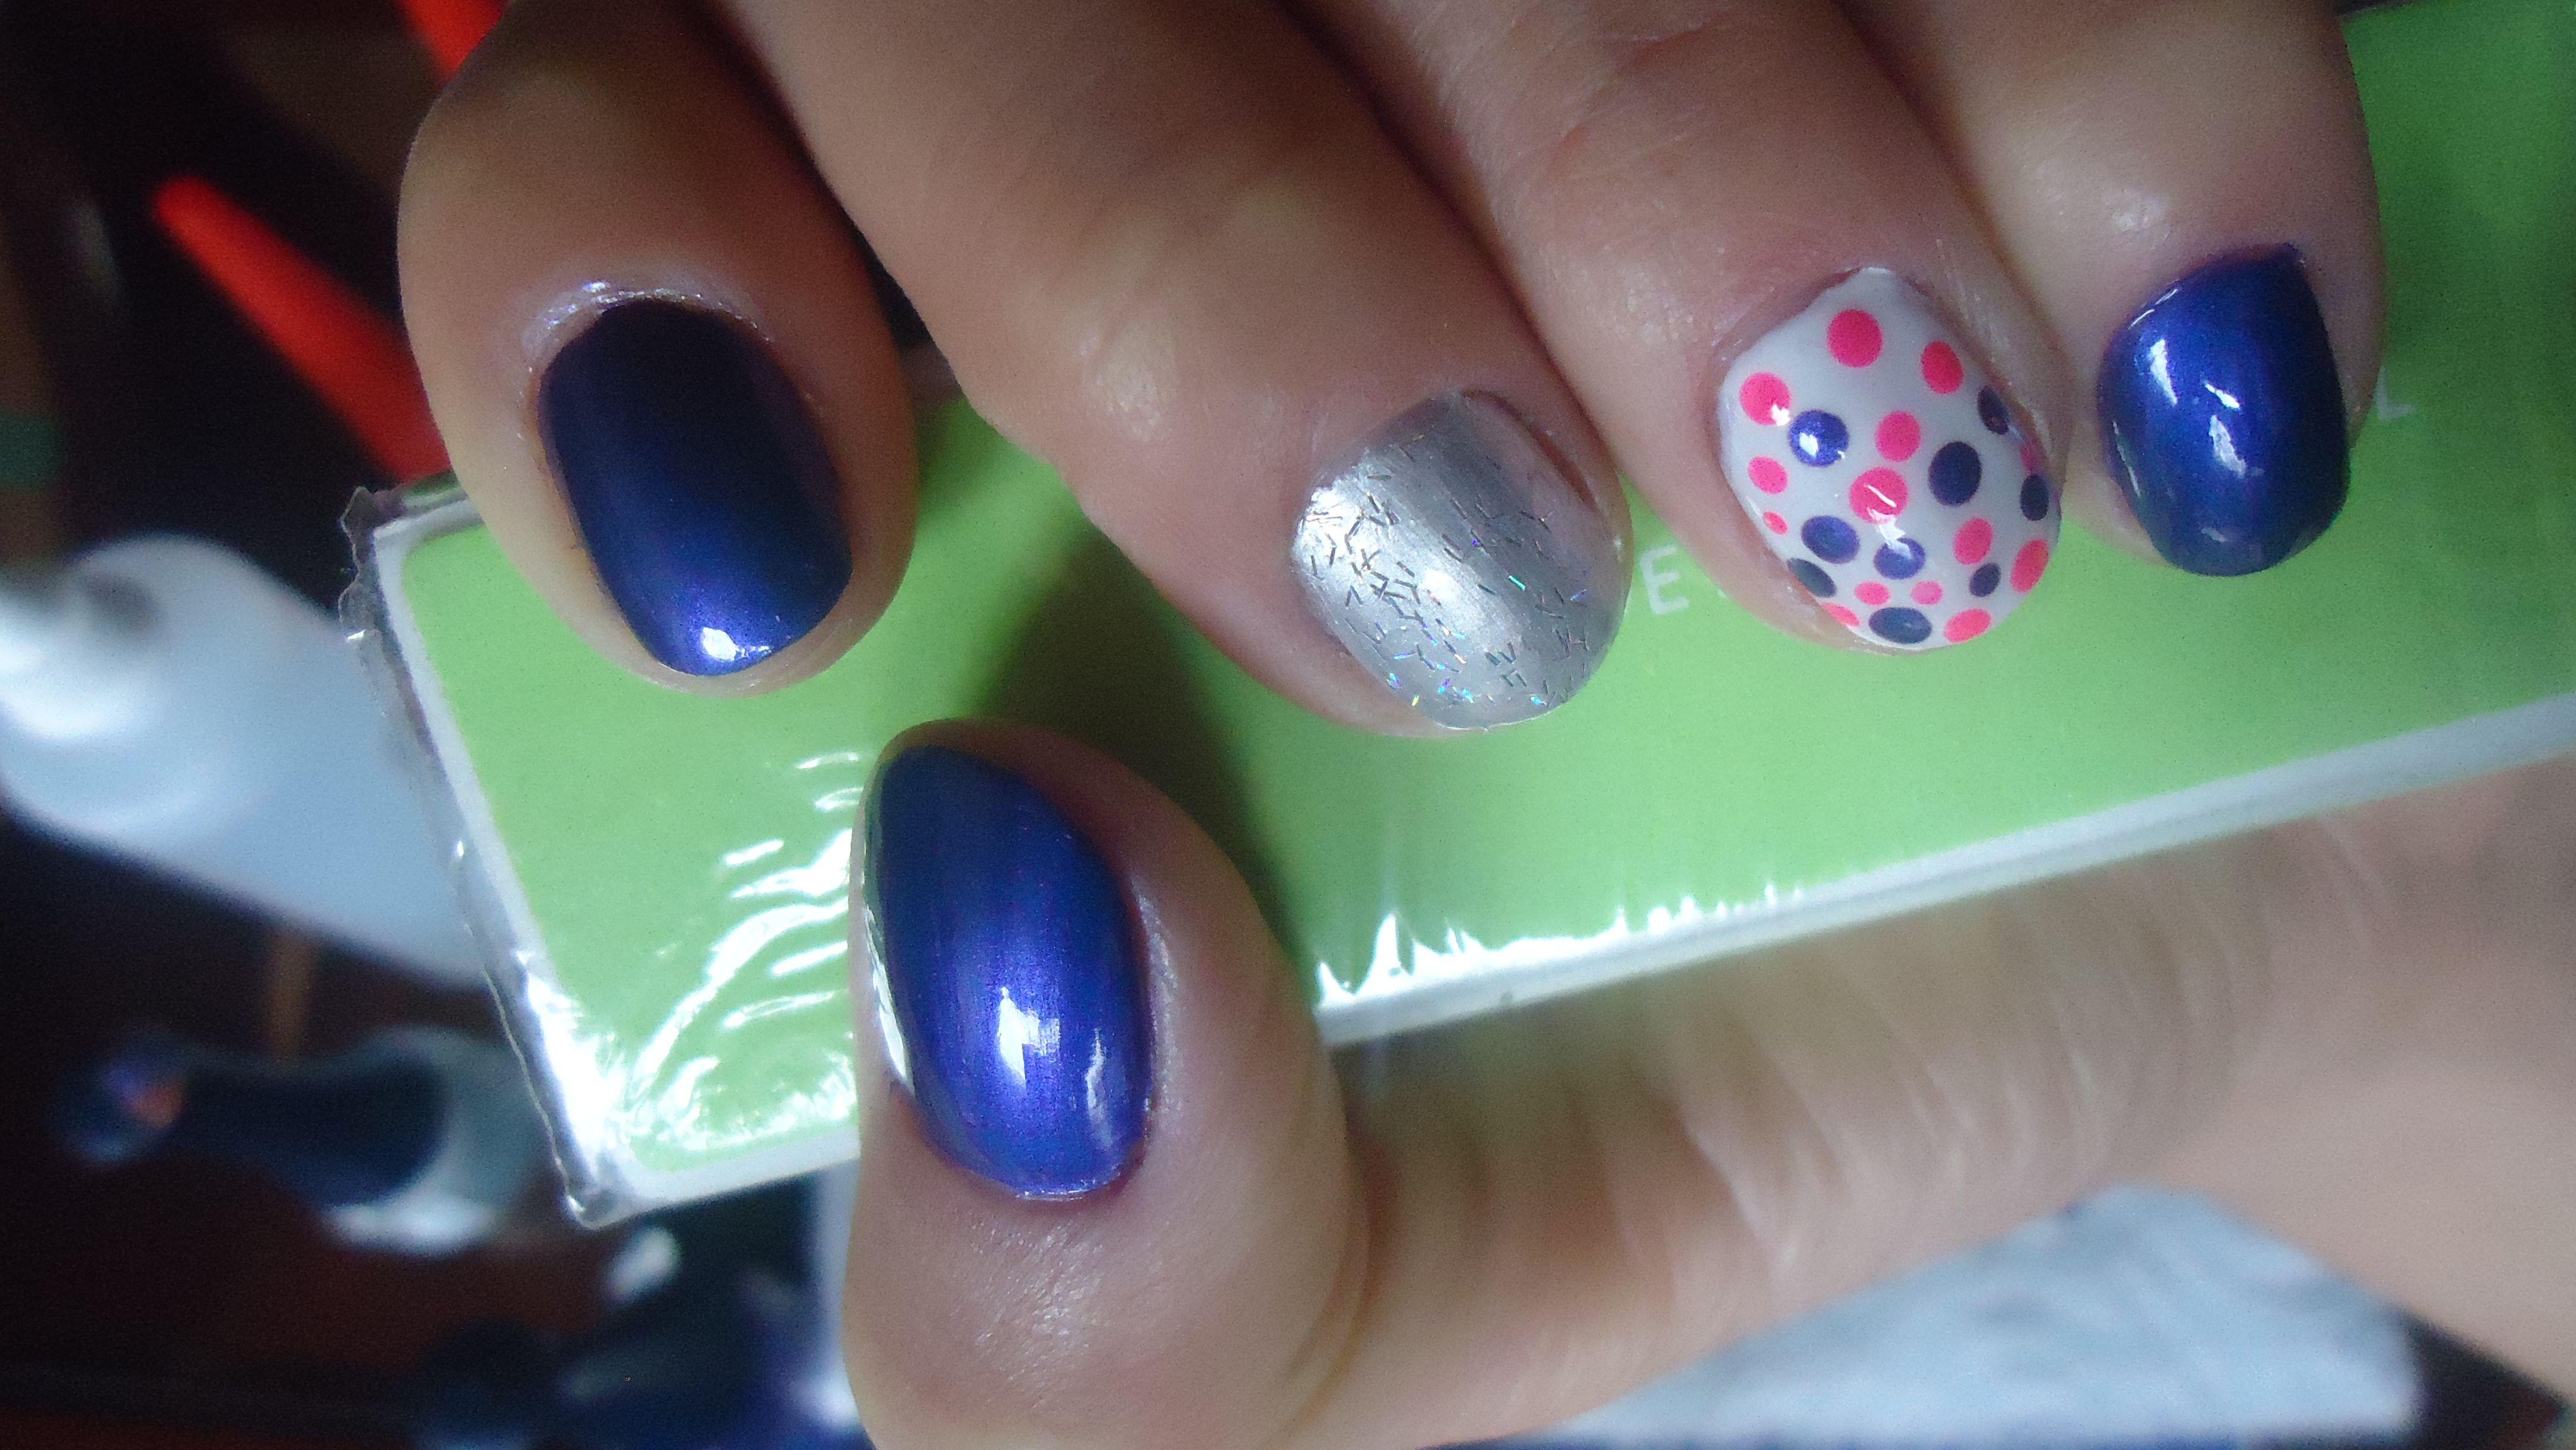 Excepcional Uñas De Acrílico De Color Púrpura Tumblr Foto - Ideas de ...